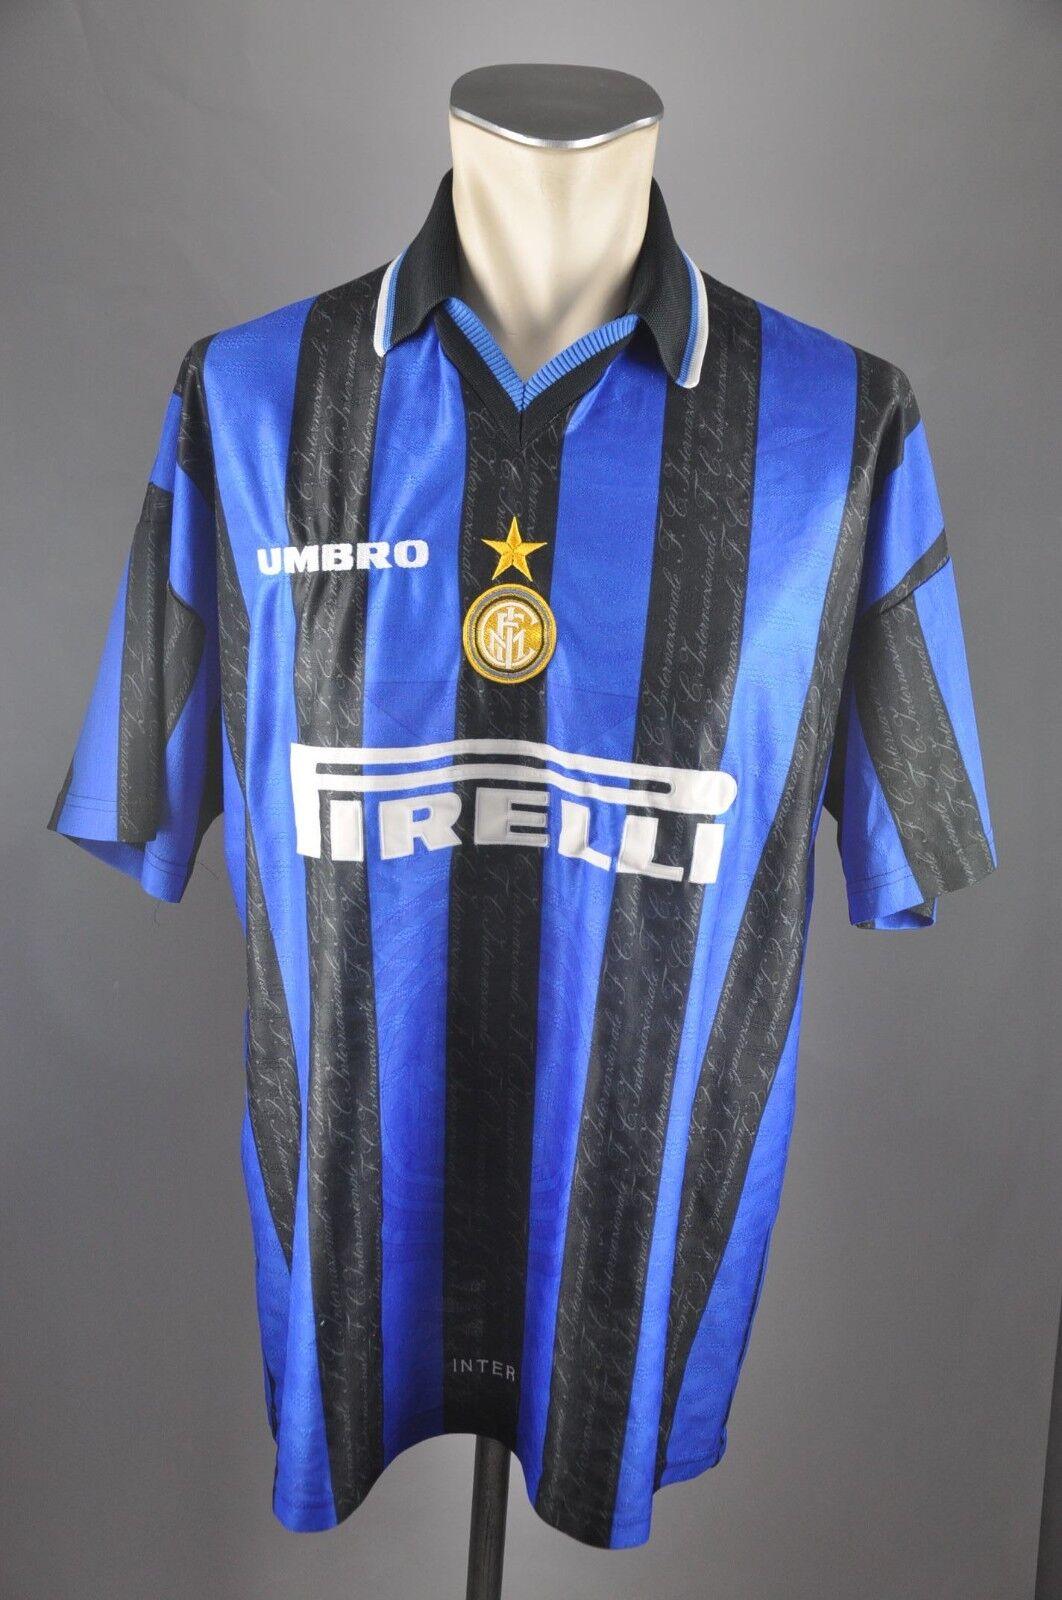 Inter Mailand Trikot Gr. Maillot XL 1997-1998 Umbro Pirelli Jersey Maillot Gr. Milan 90s 28fa2d